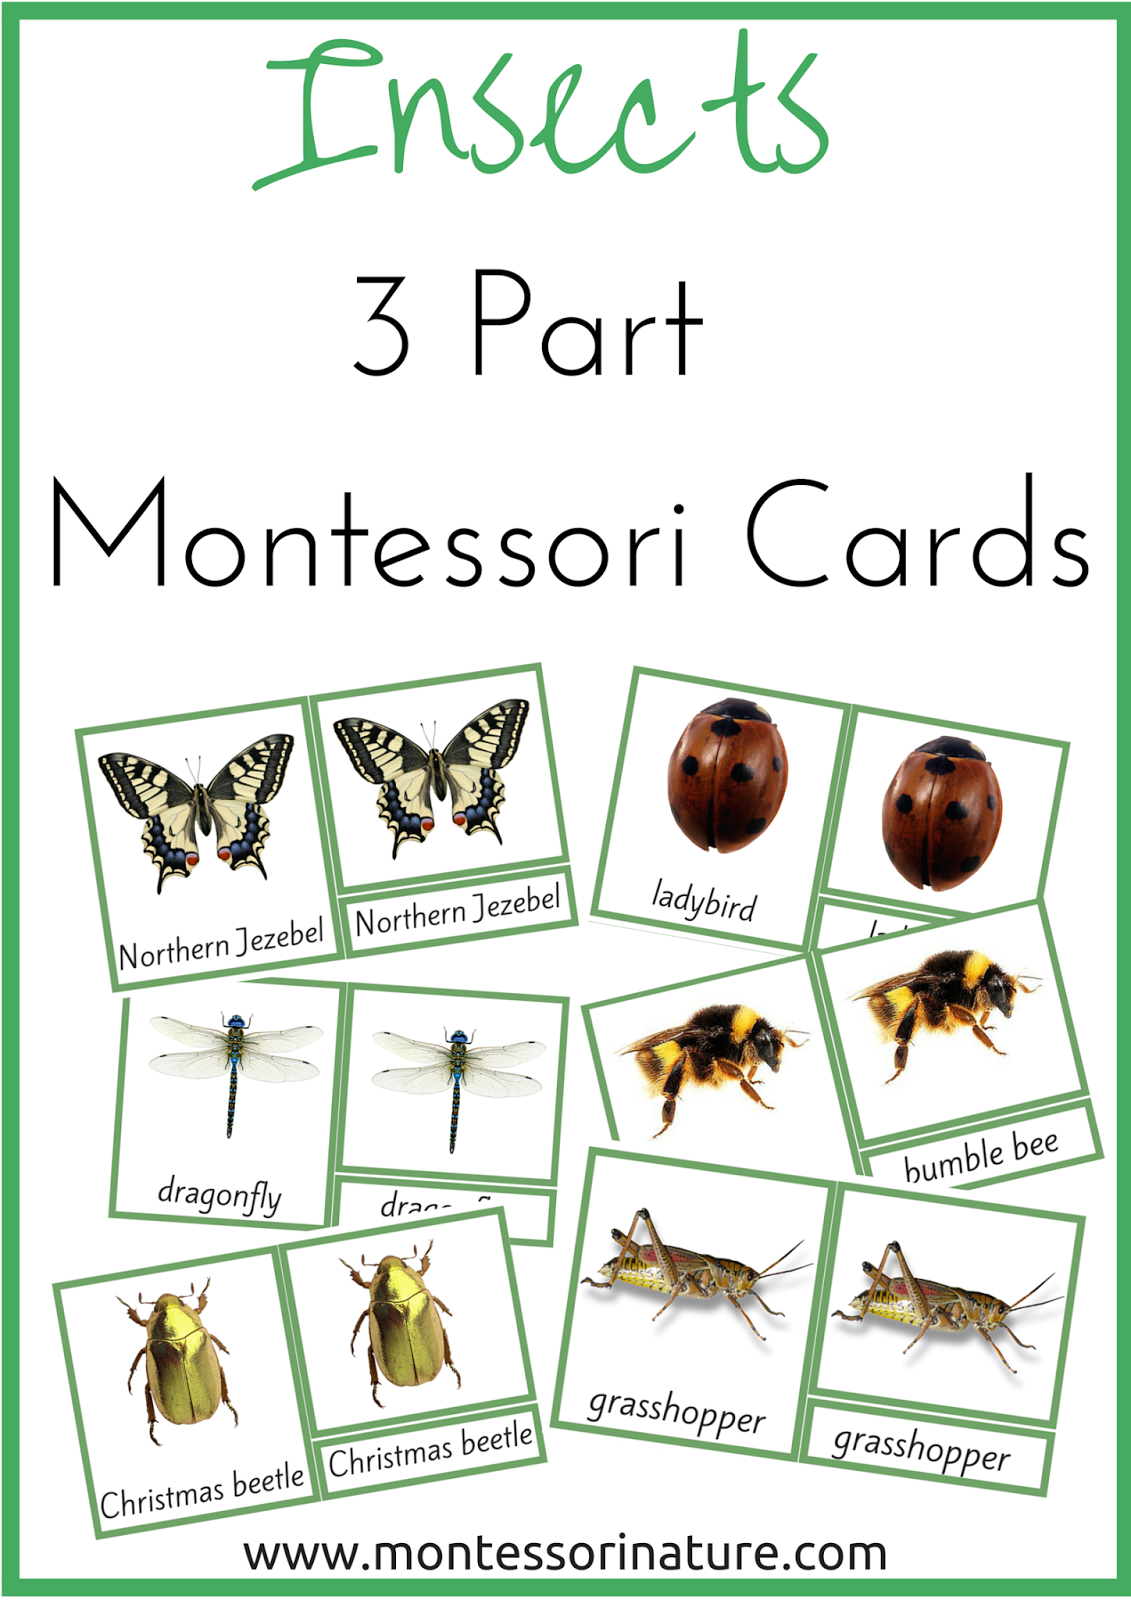 Insects 3 Part Montessori Nomenclature Cards